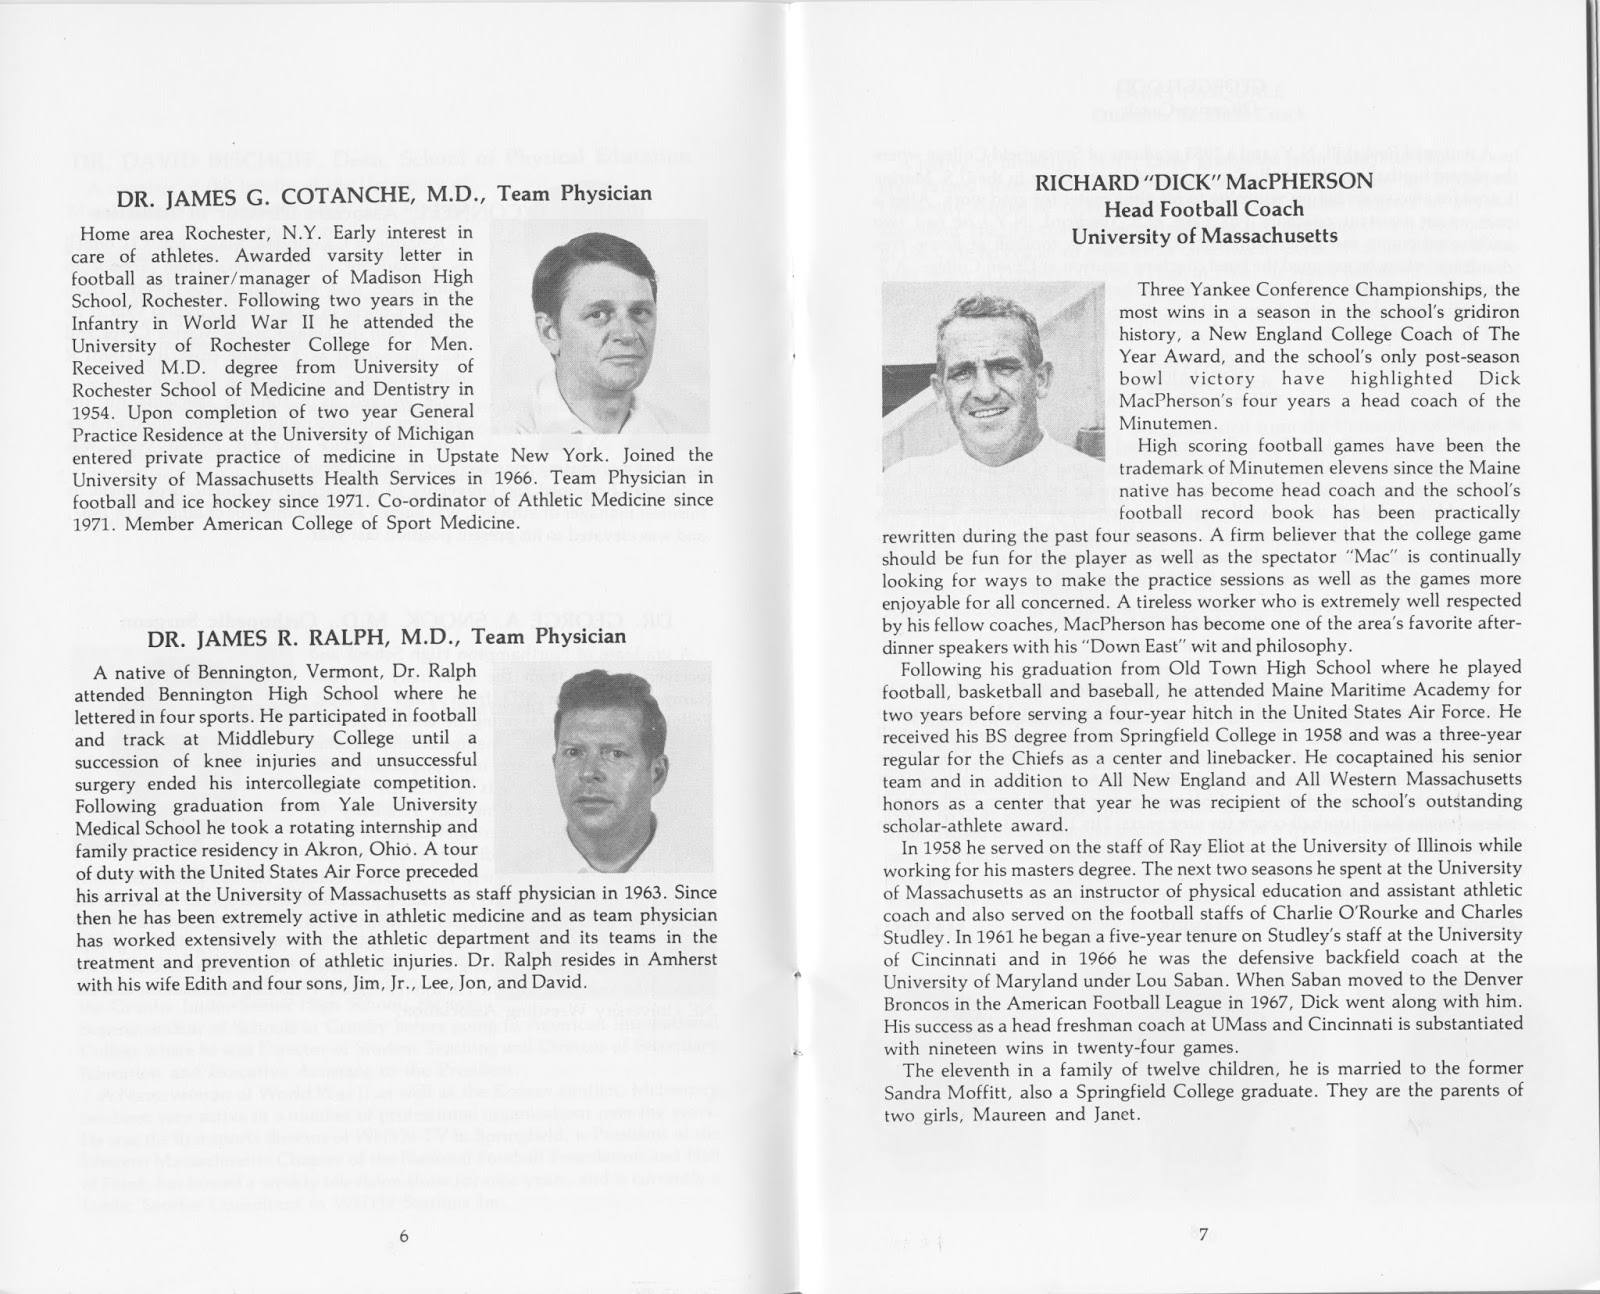 UMass Football Blog: UMass Football History--Scans of the